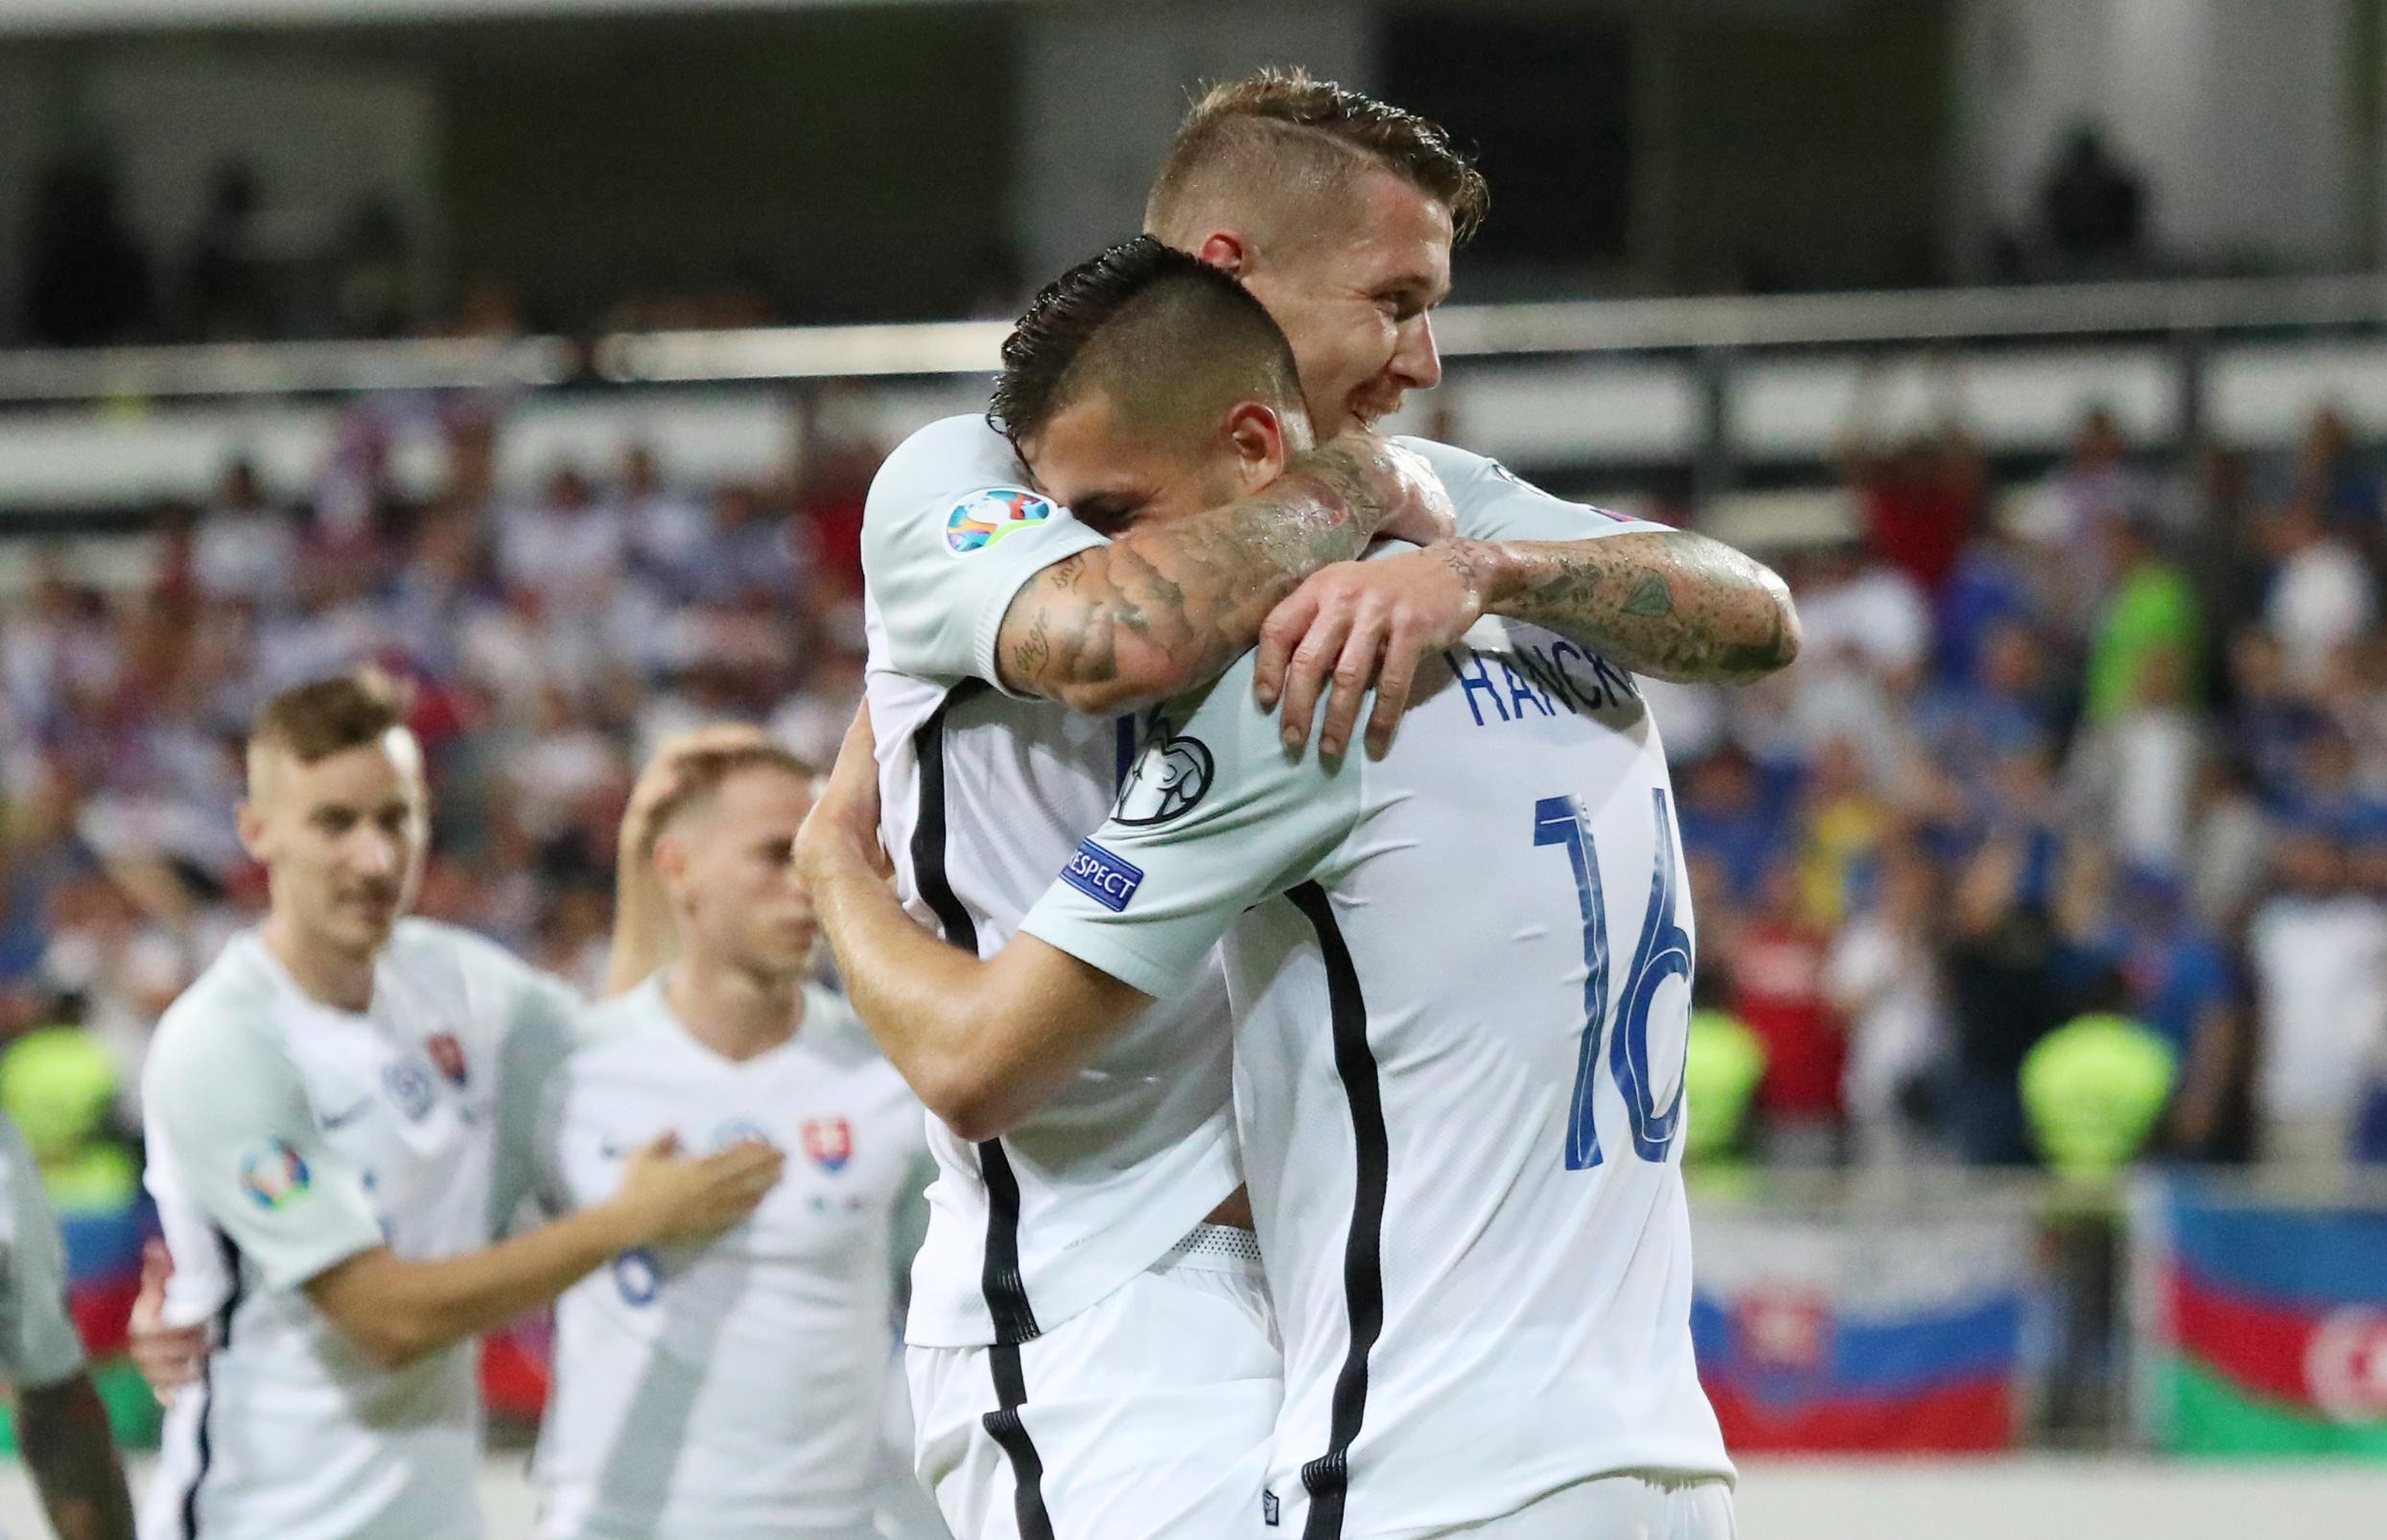 Soccer Football - Euro 2020 Qualifier - Group E - Azerbaijan v Slovakia - Bakcell Arena, Baku, Azerbaijan - June 11, 2019  Slovakia's David Hancko celebrates scoring their fifth goal with team mates   REUTERS/Aziz Karimov